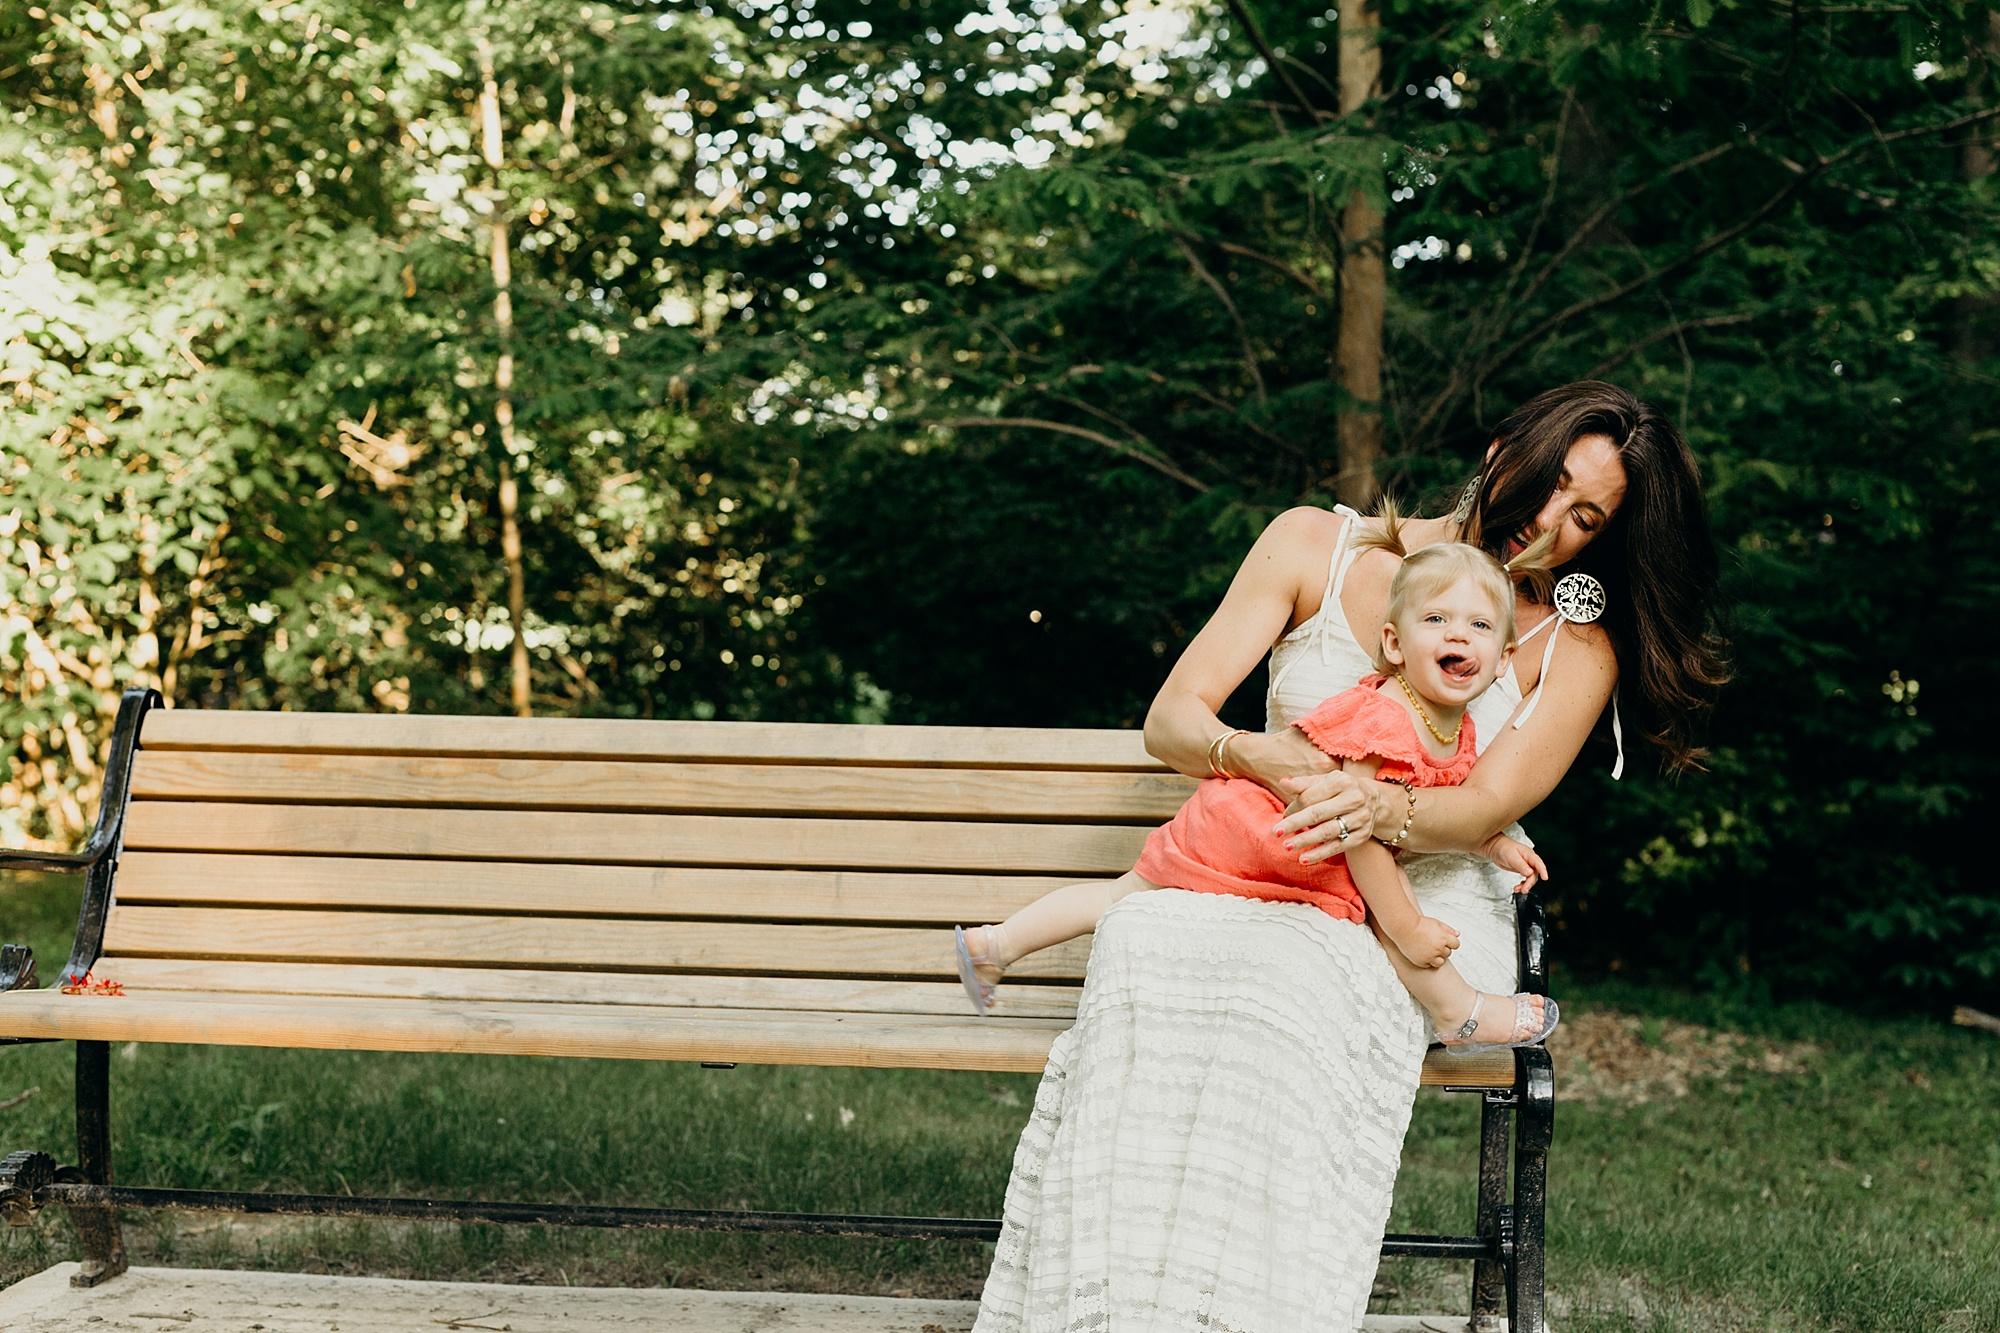 Joe_Mac_Creative_Maternity_West_Chester_Wedding_Photography_Philly_Best_Philadlephia__0131.jpg